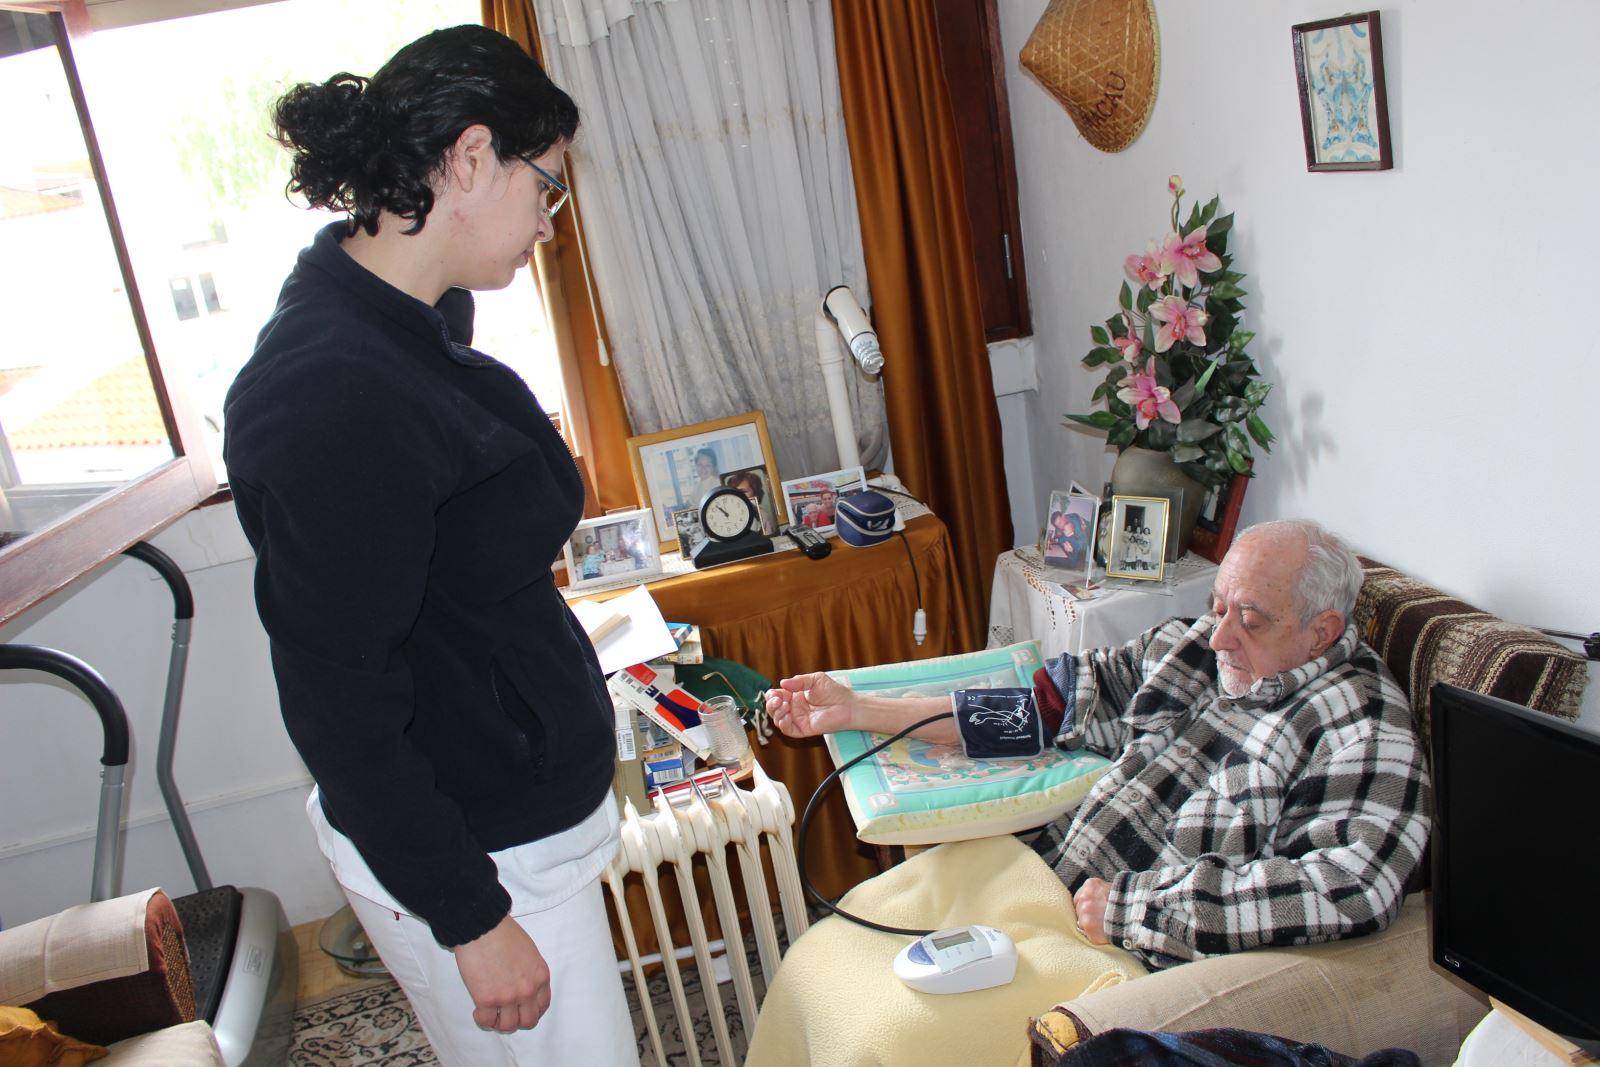 Mértola | Cuidados de enfermagem em casa